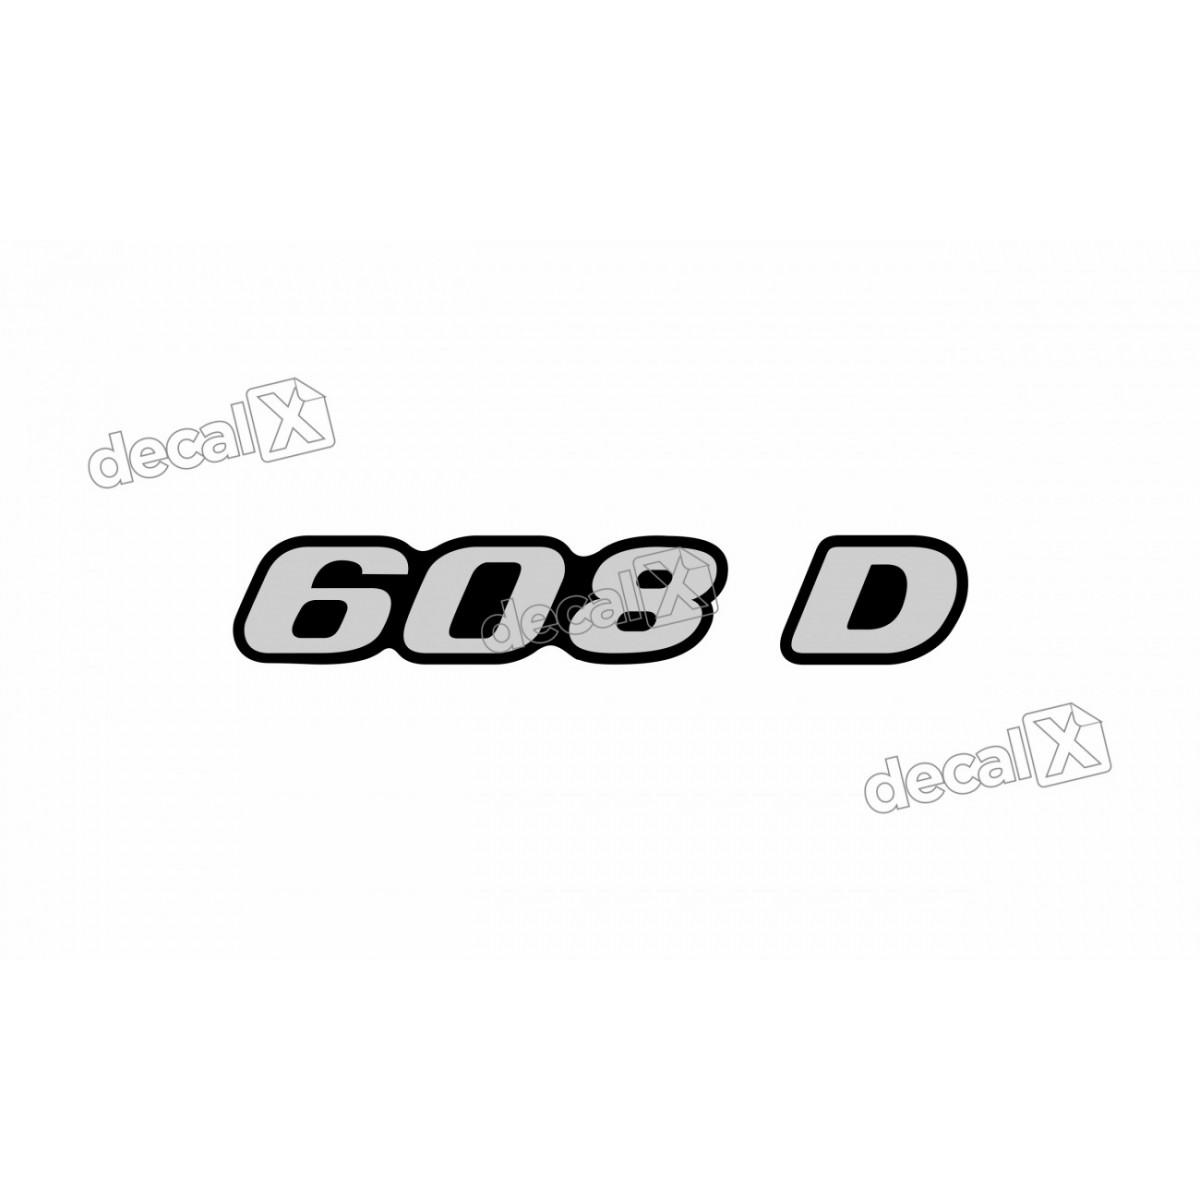 Adesivo Emblema Resinado Mercedes 608 D Cm1 Decalx